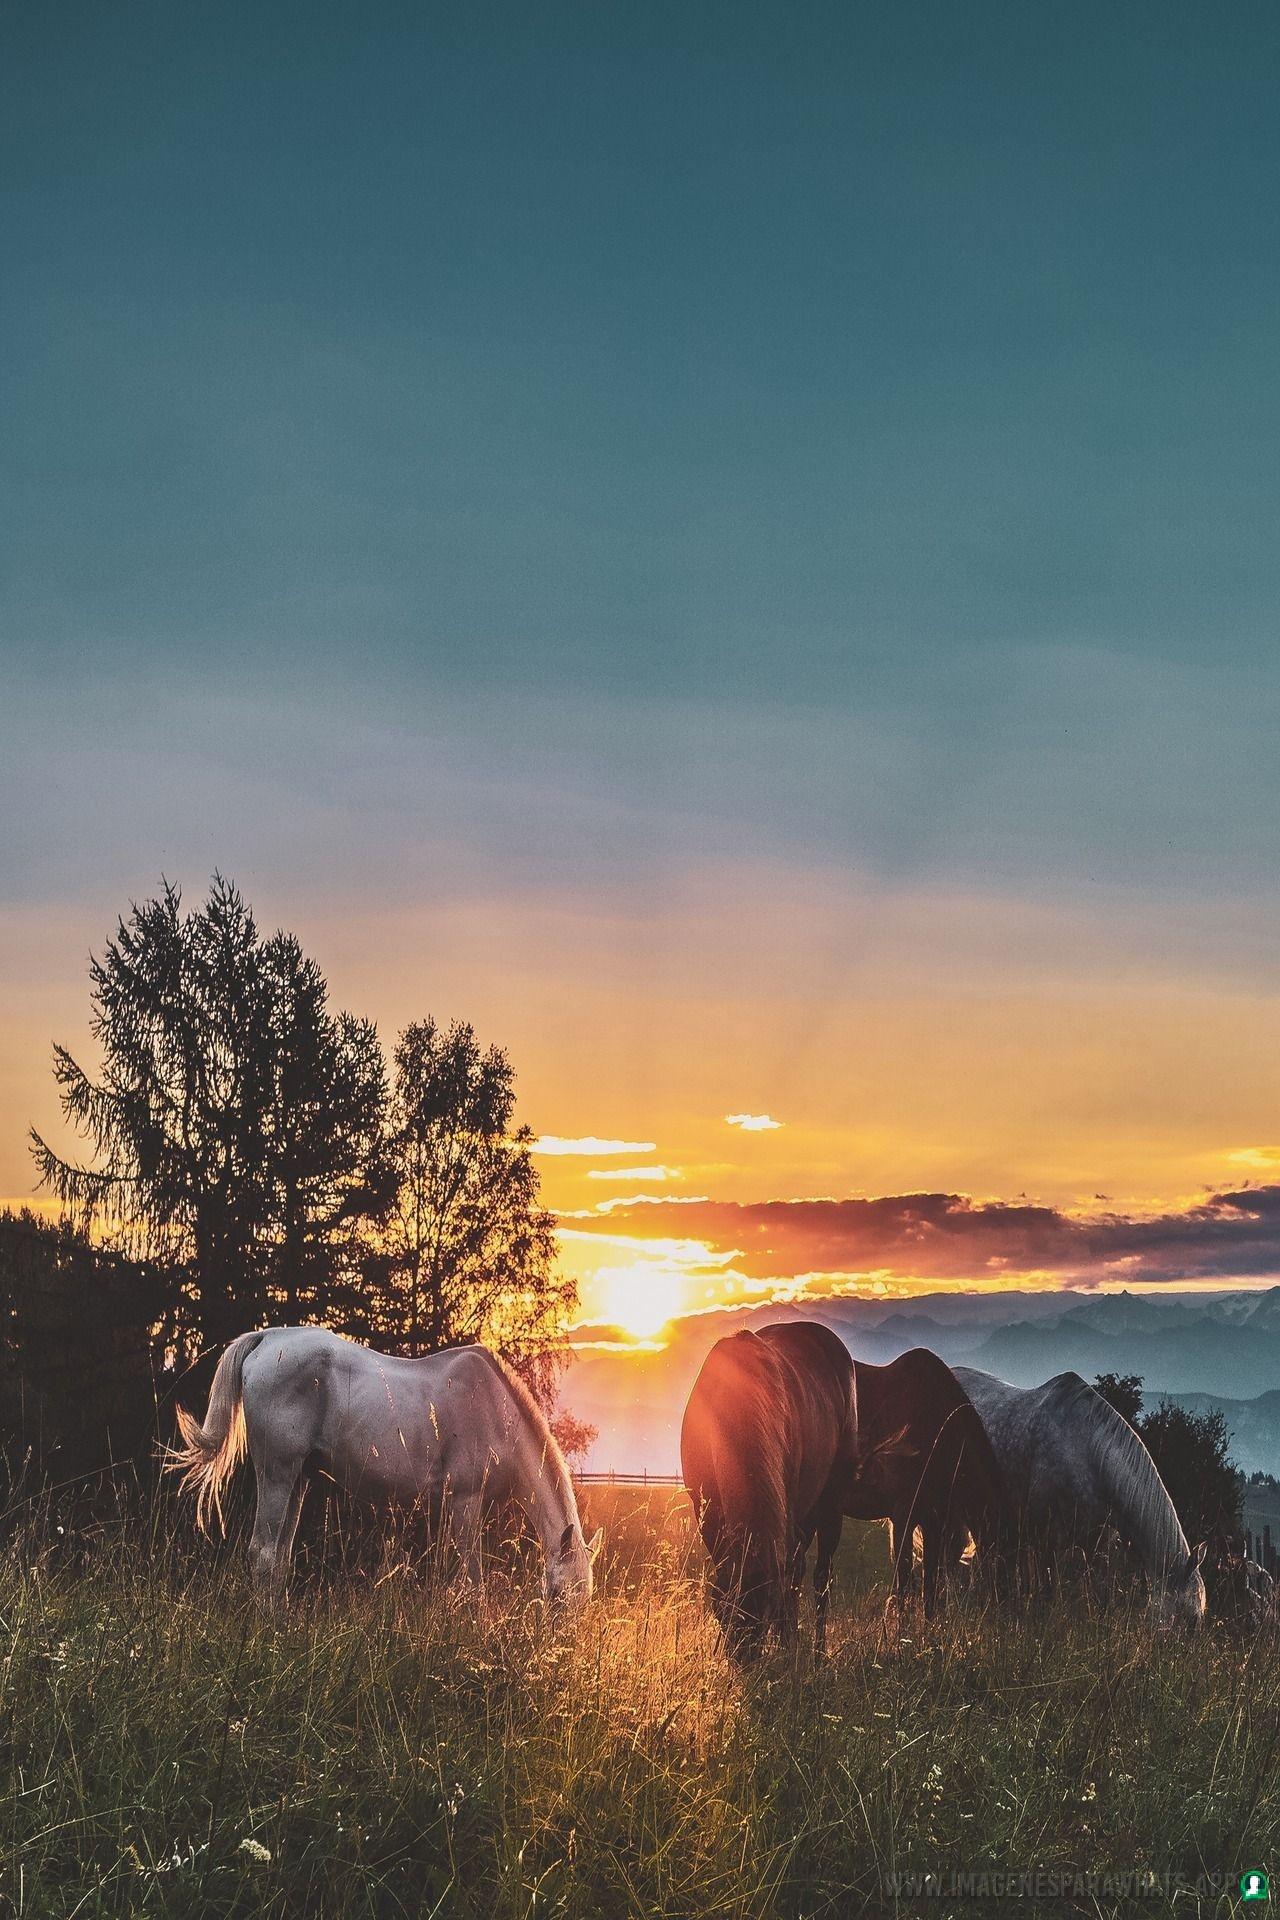 Imagenes-de-caballos-120